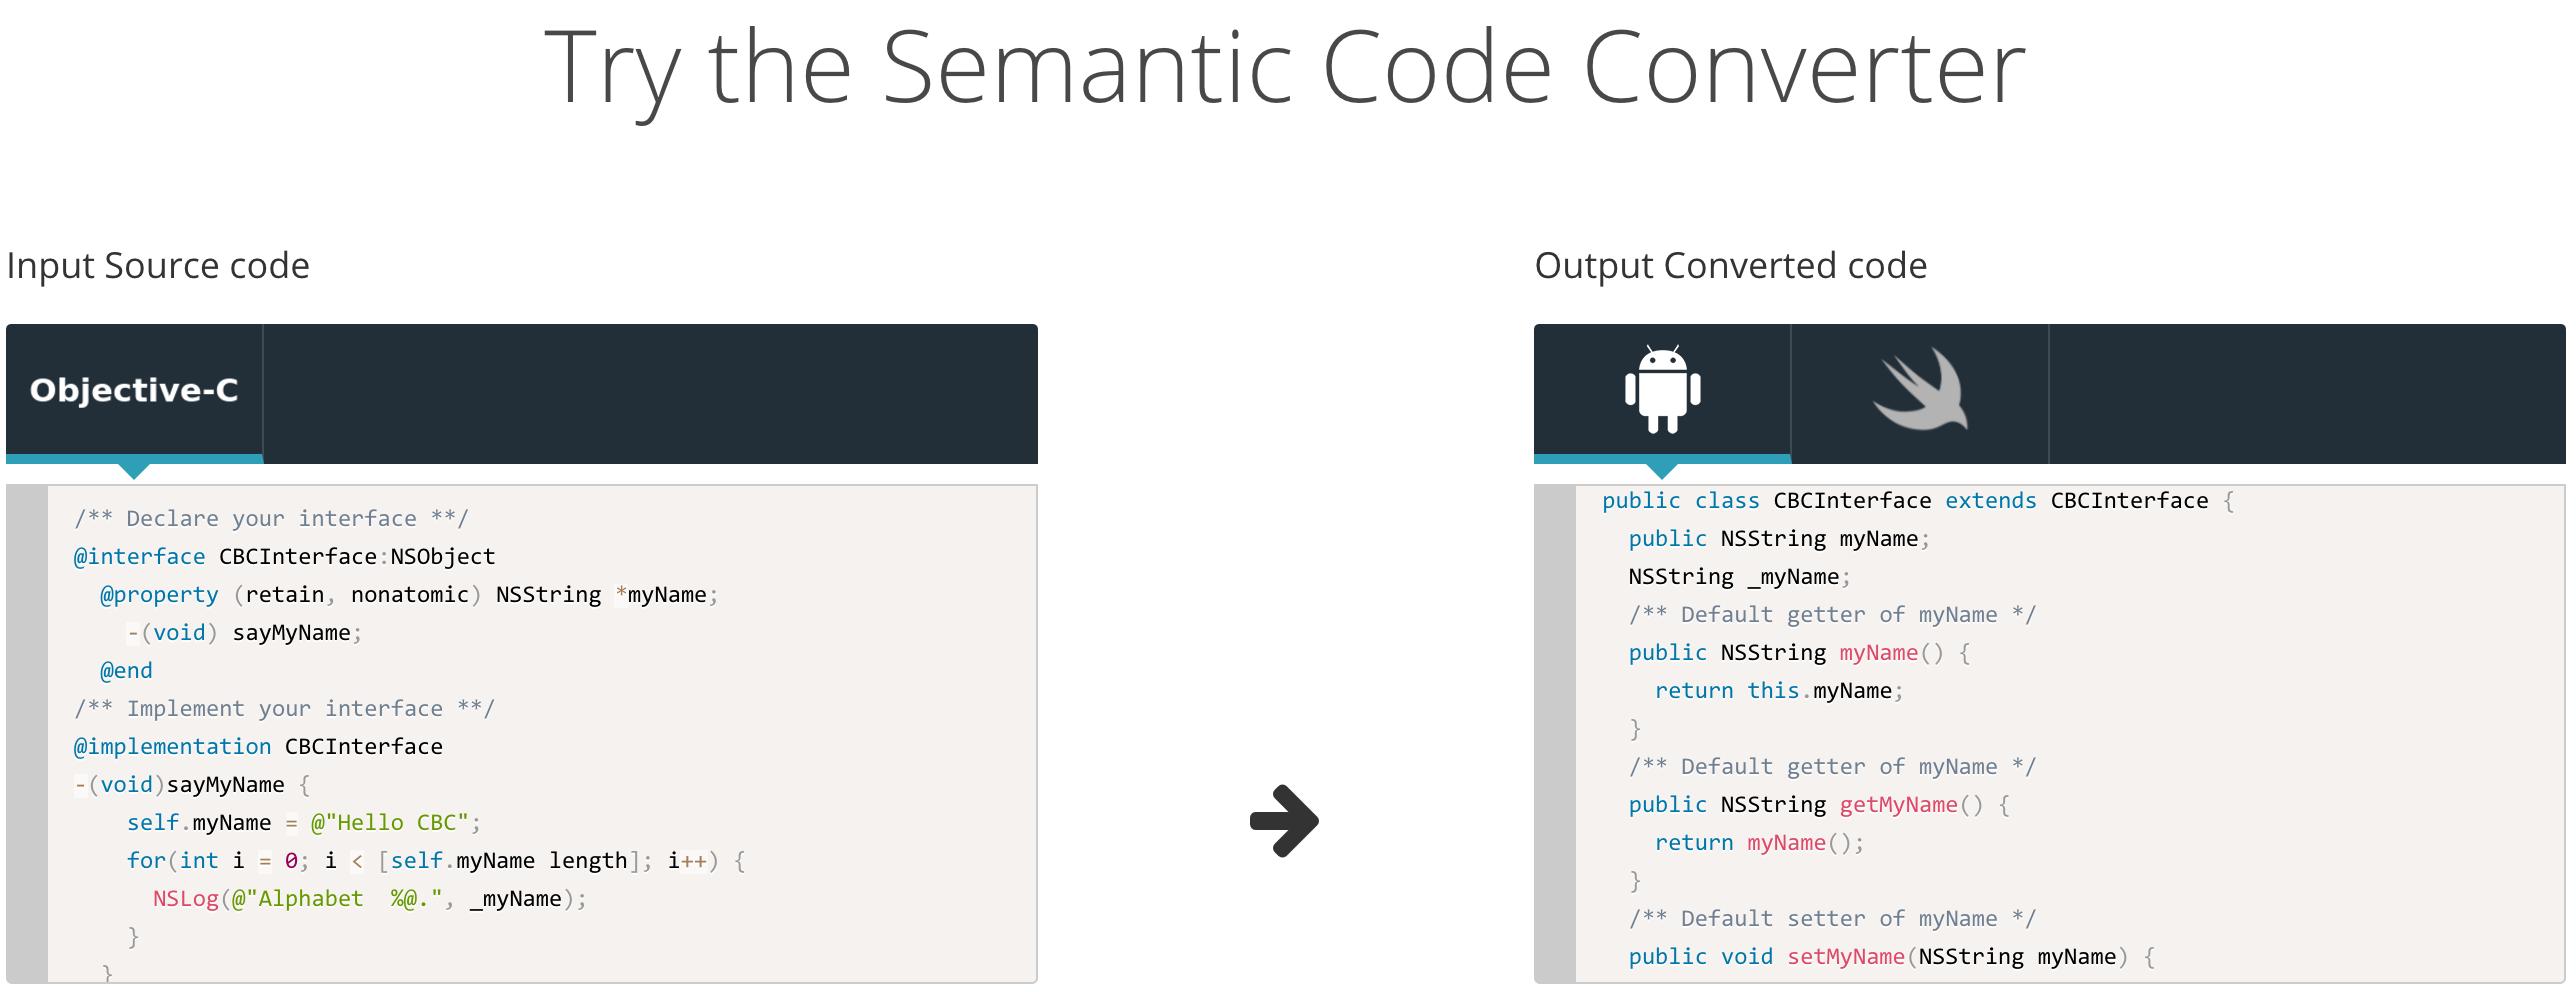 myappconverter-code-converting-sample